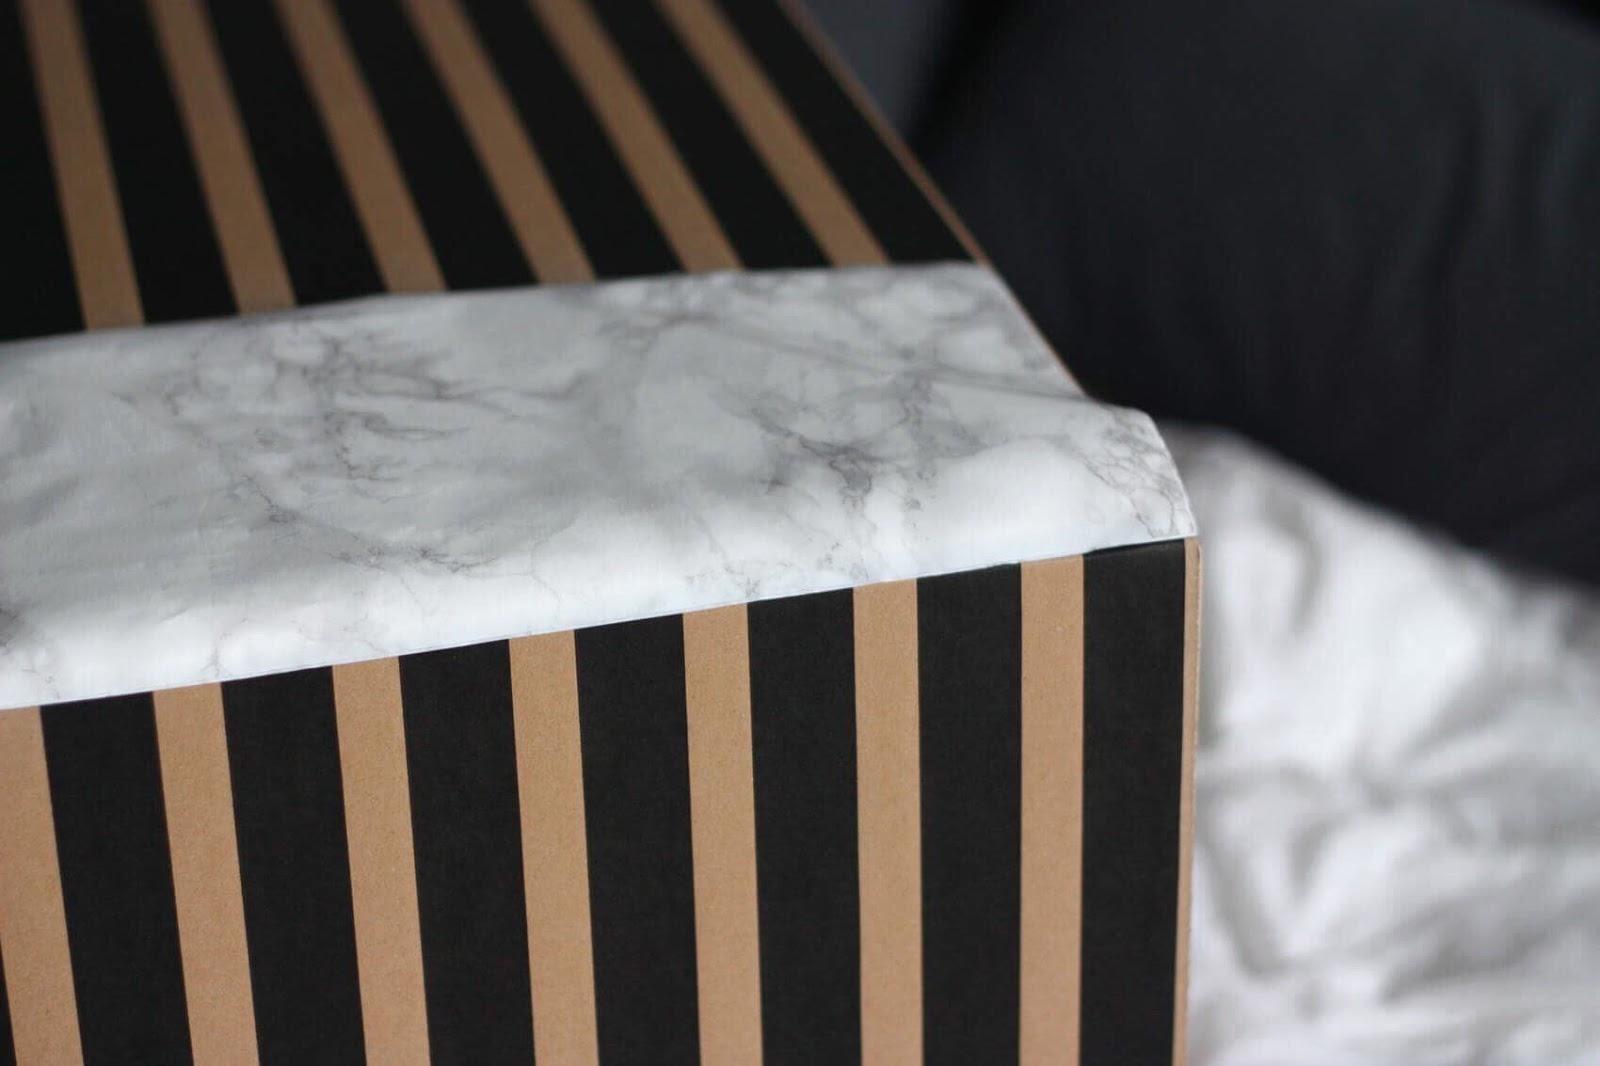 marmurowe pudełko diy, marmur diy, pojemnik marmurowy